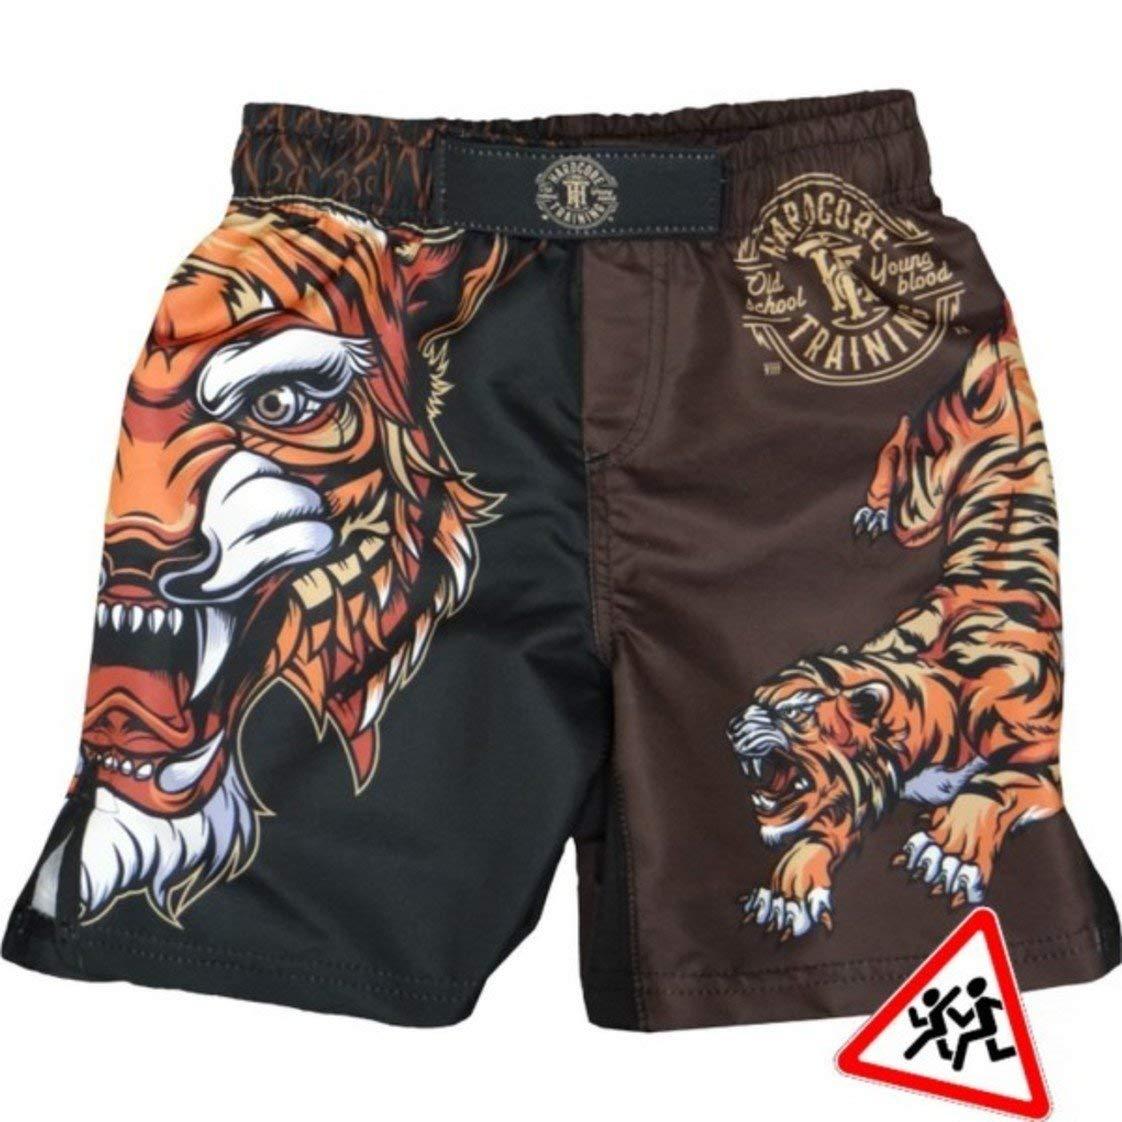 Kids ShortsハードコアトレーニングTiger MMA Fitness Boys 6 Years  B071RTNHVM